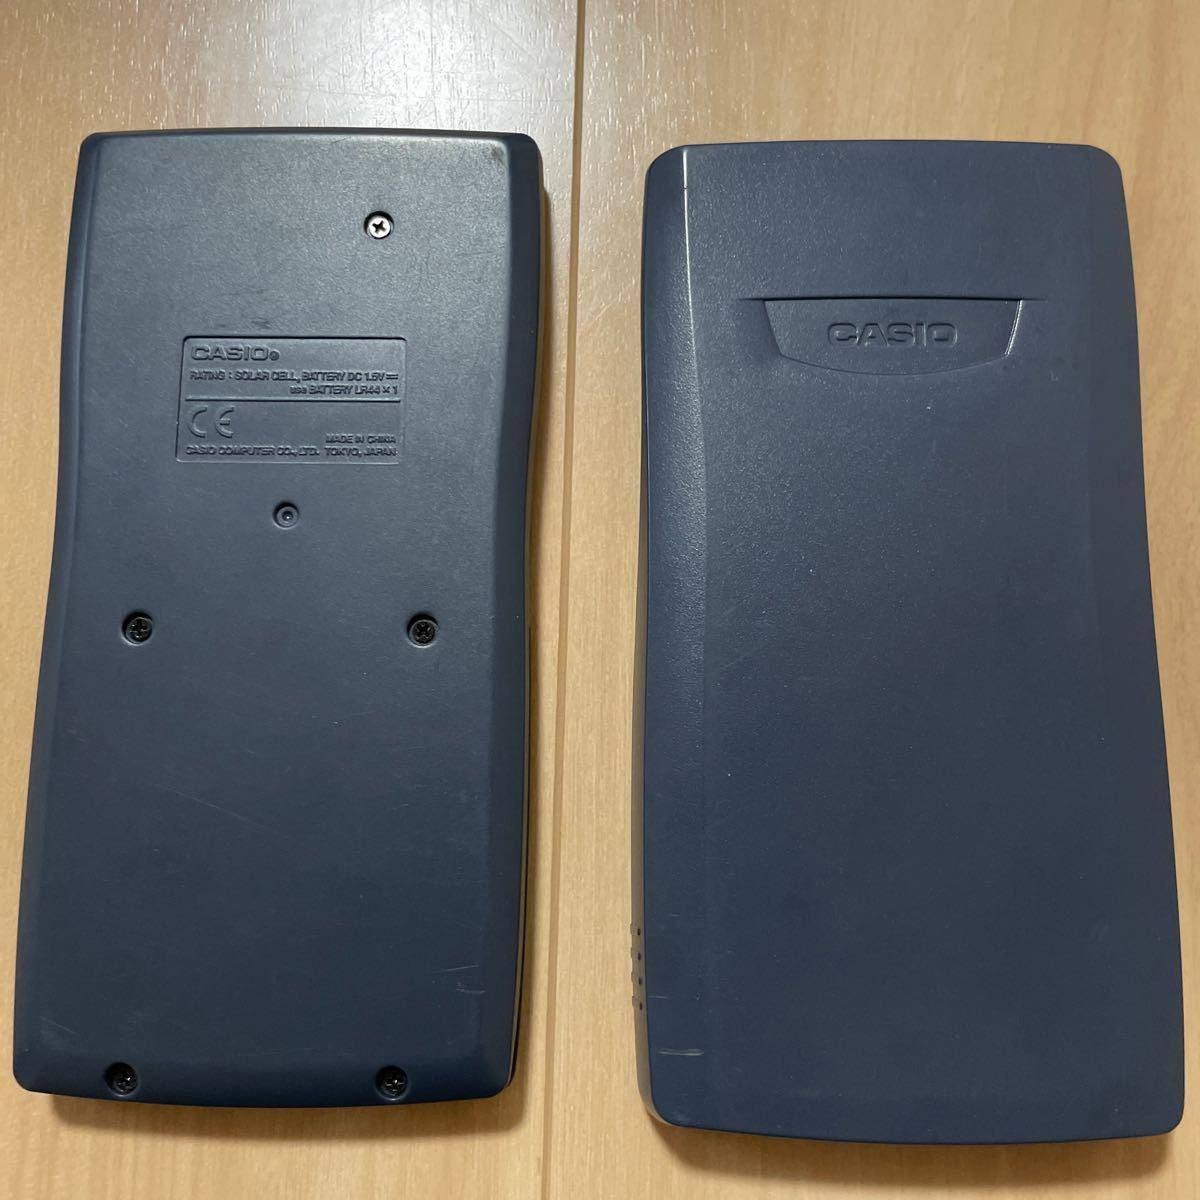 CASIO S‐Vパム 関数電卓 FX-991MS-N